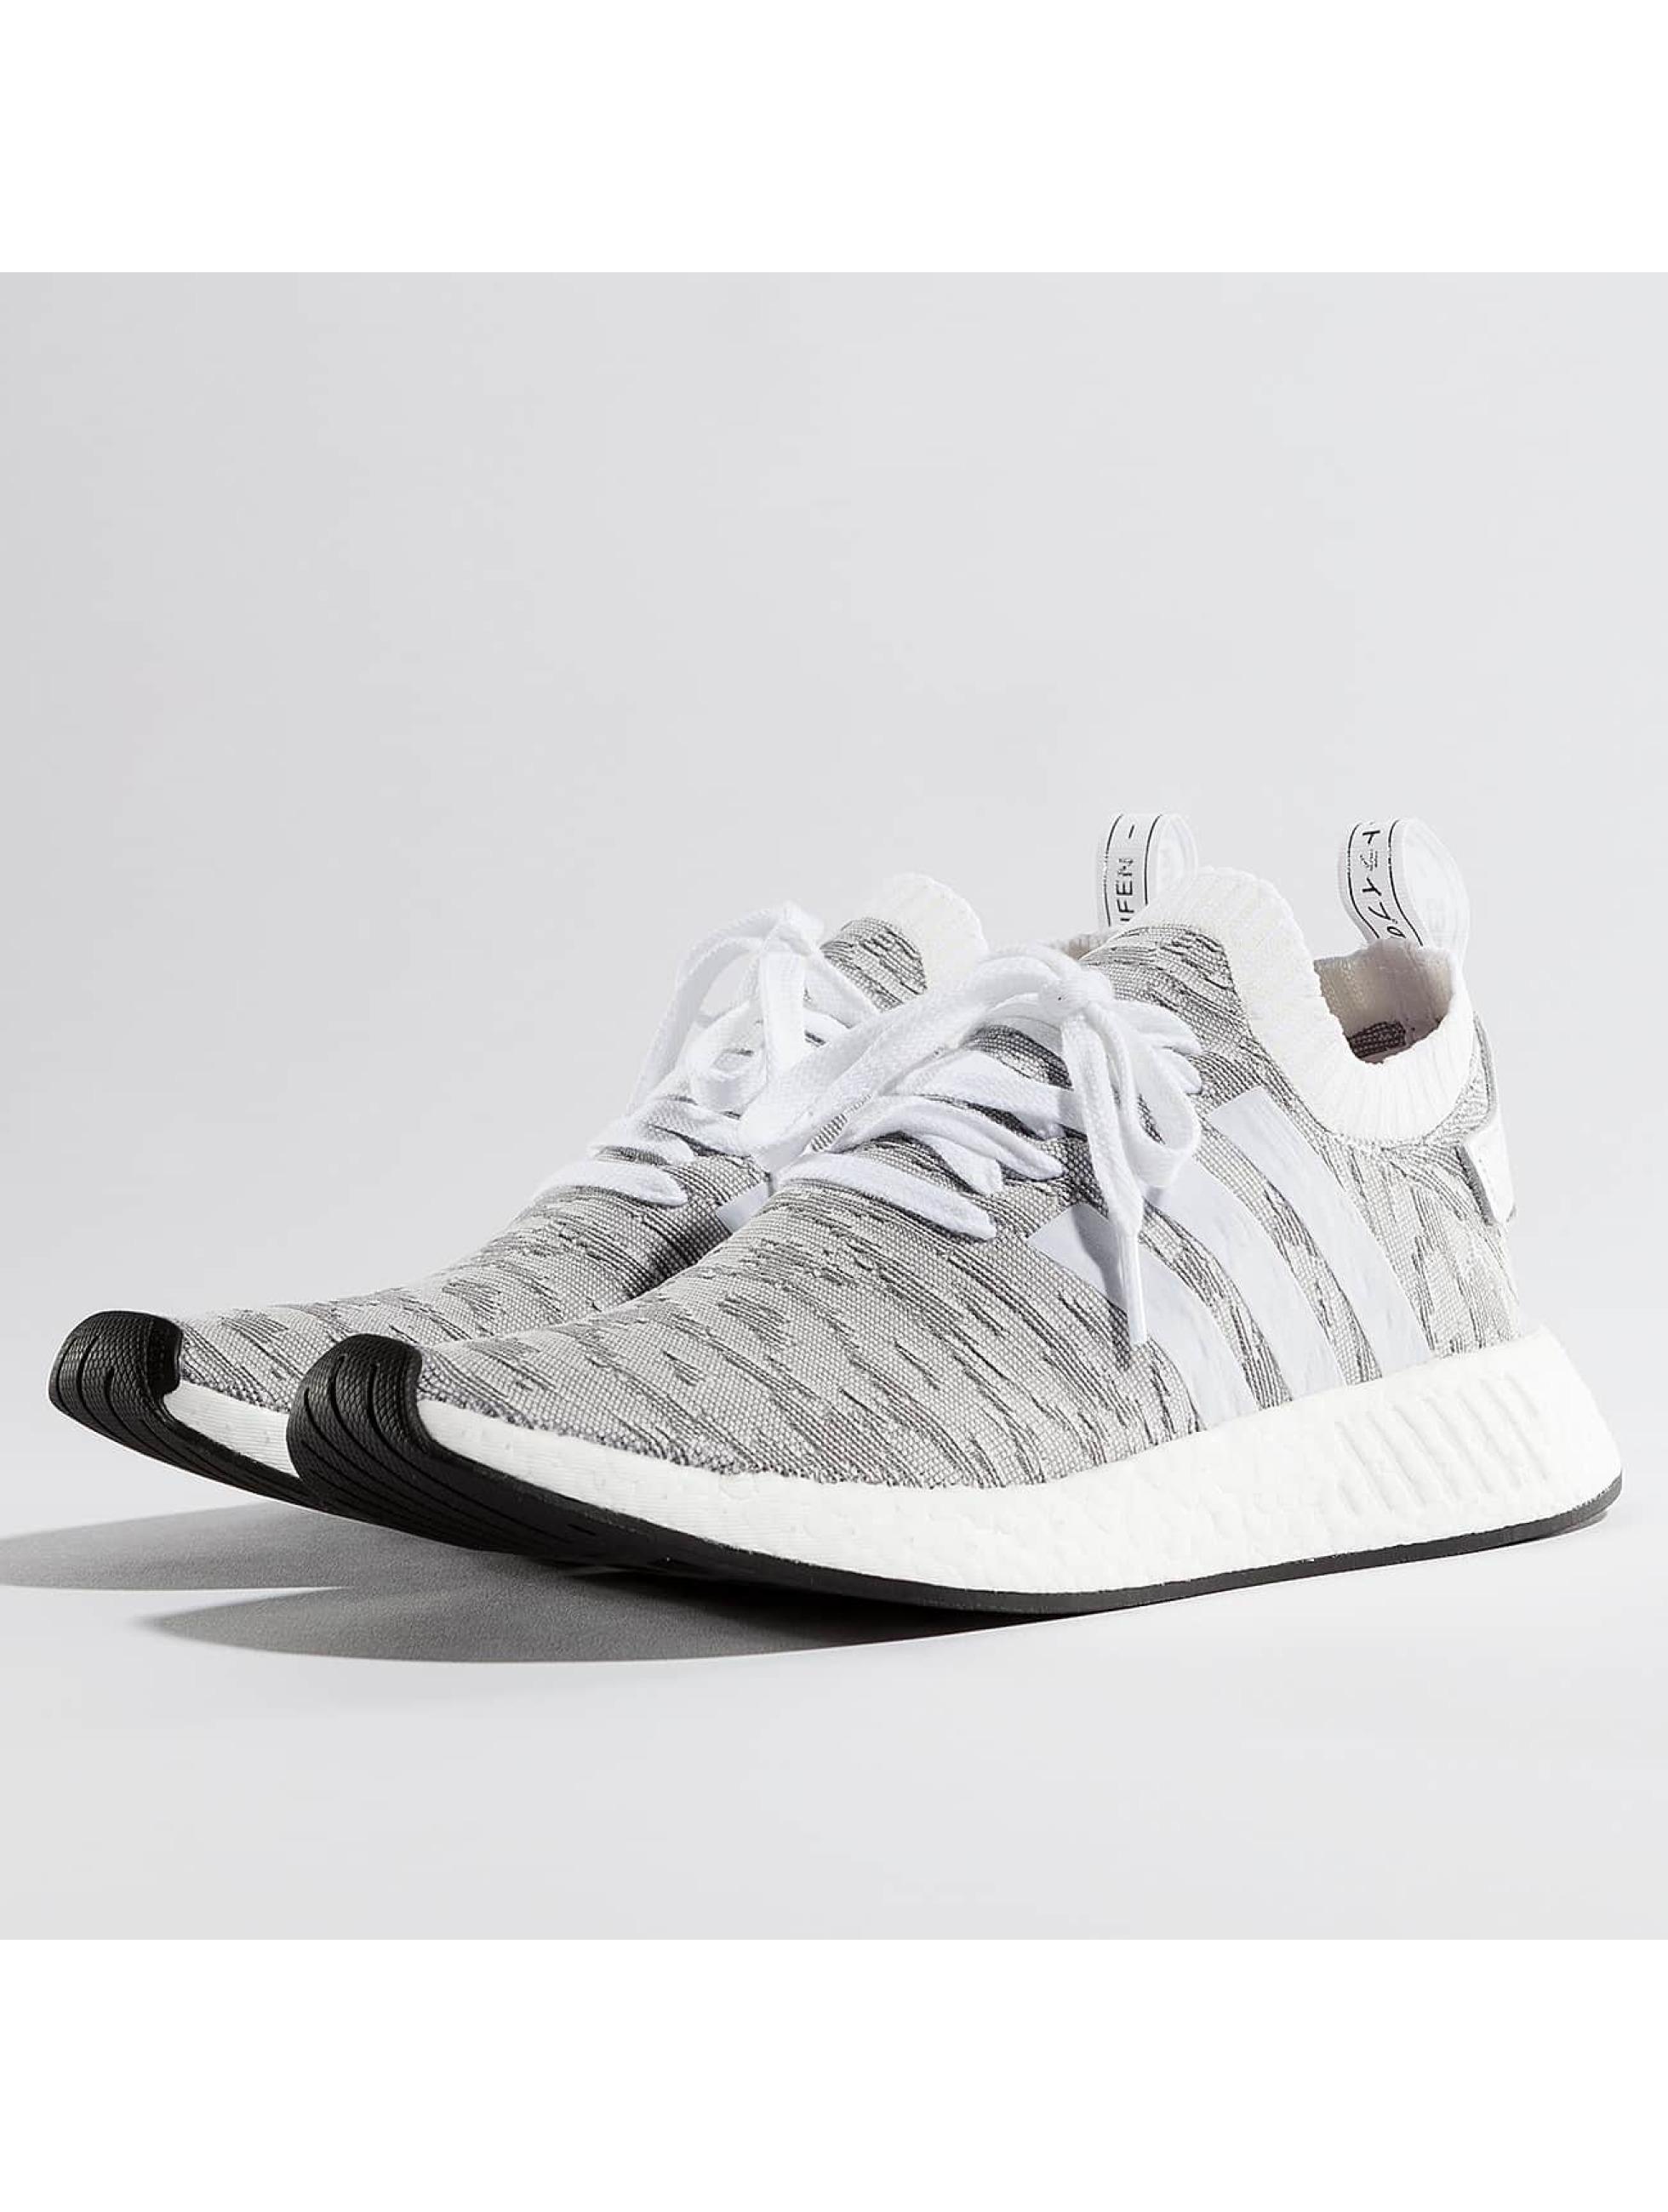 adidas nmd r2 pk blanc homme baskets adidas acheter pas cher chaussures 367994. Black Bedroom Furniture Sets. Home Design Ideas